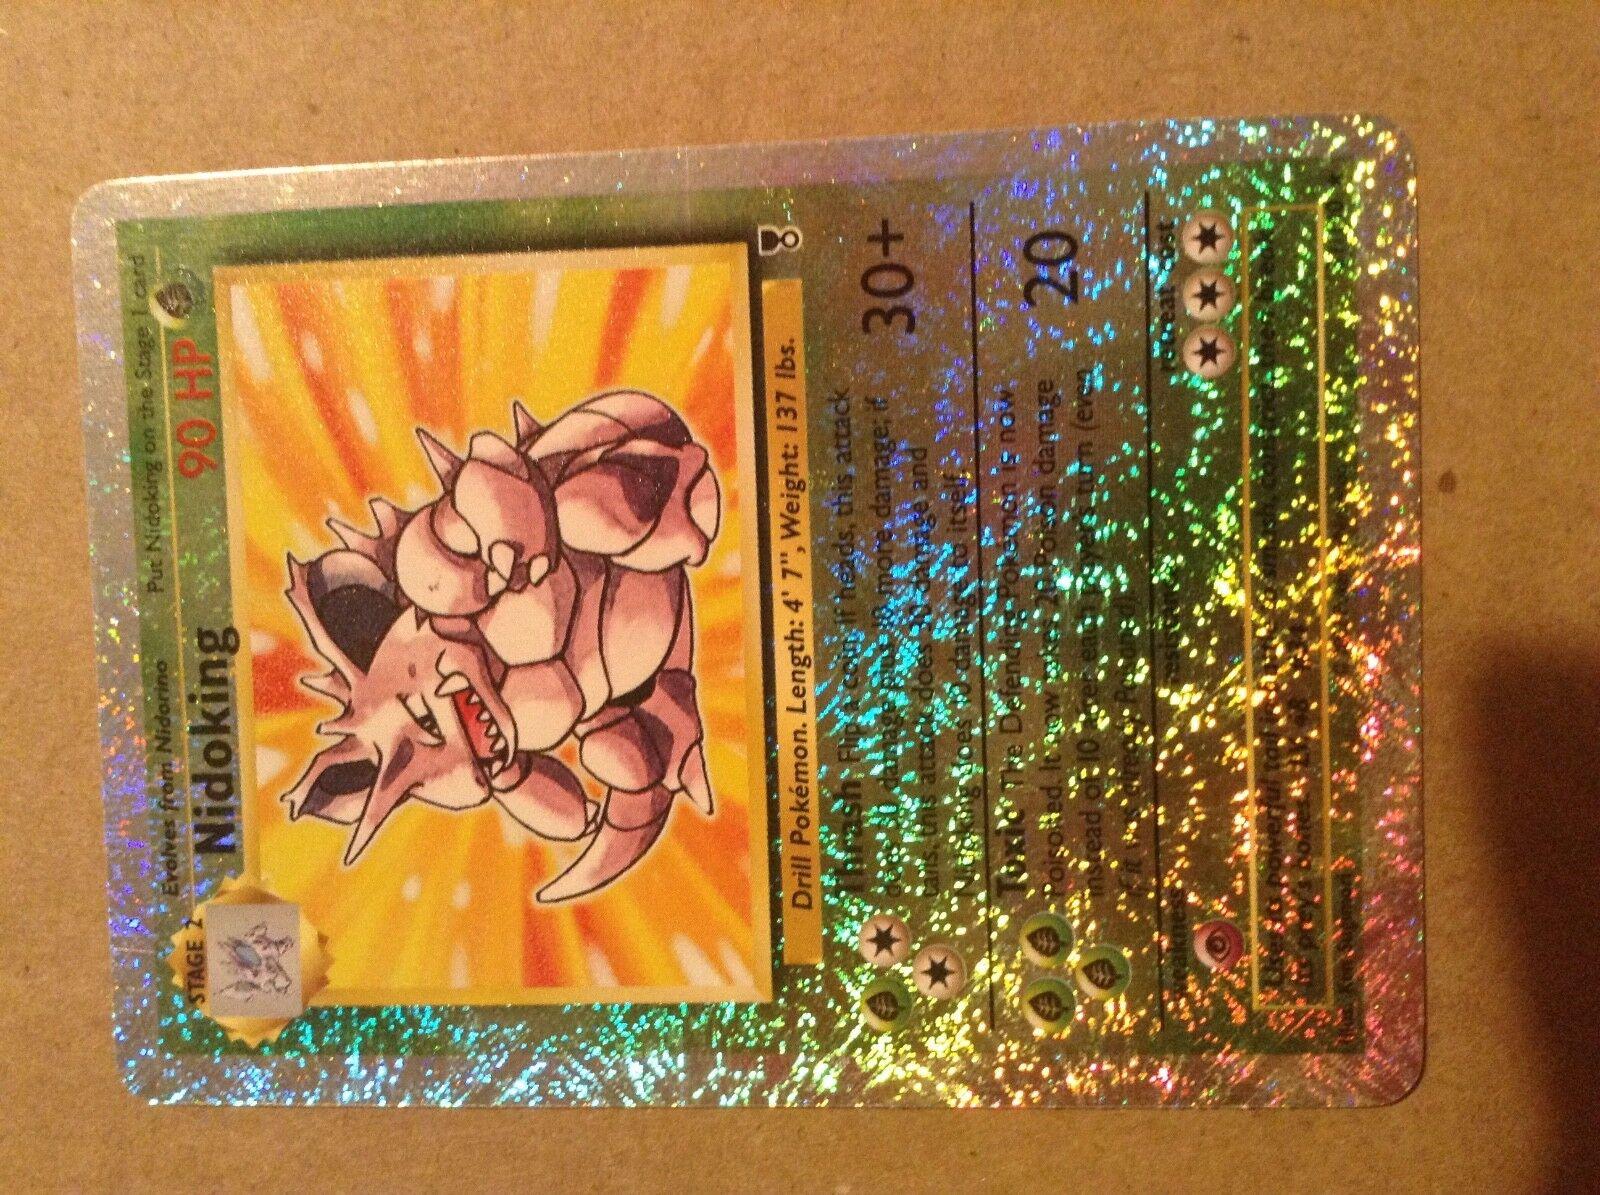 Pokemon Card - Nidoking - (31 110) Legendary Collection Reverse Holo - NM MINT